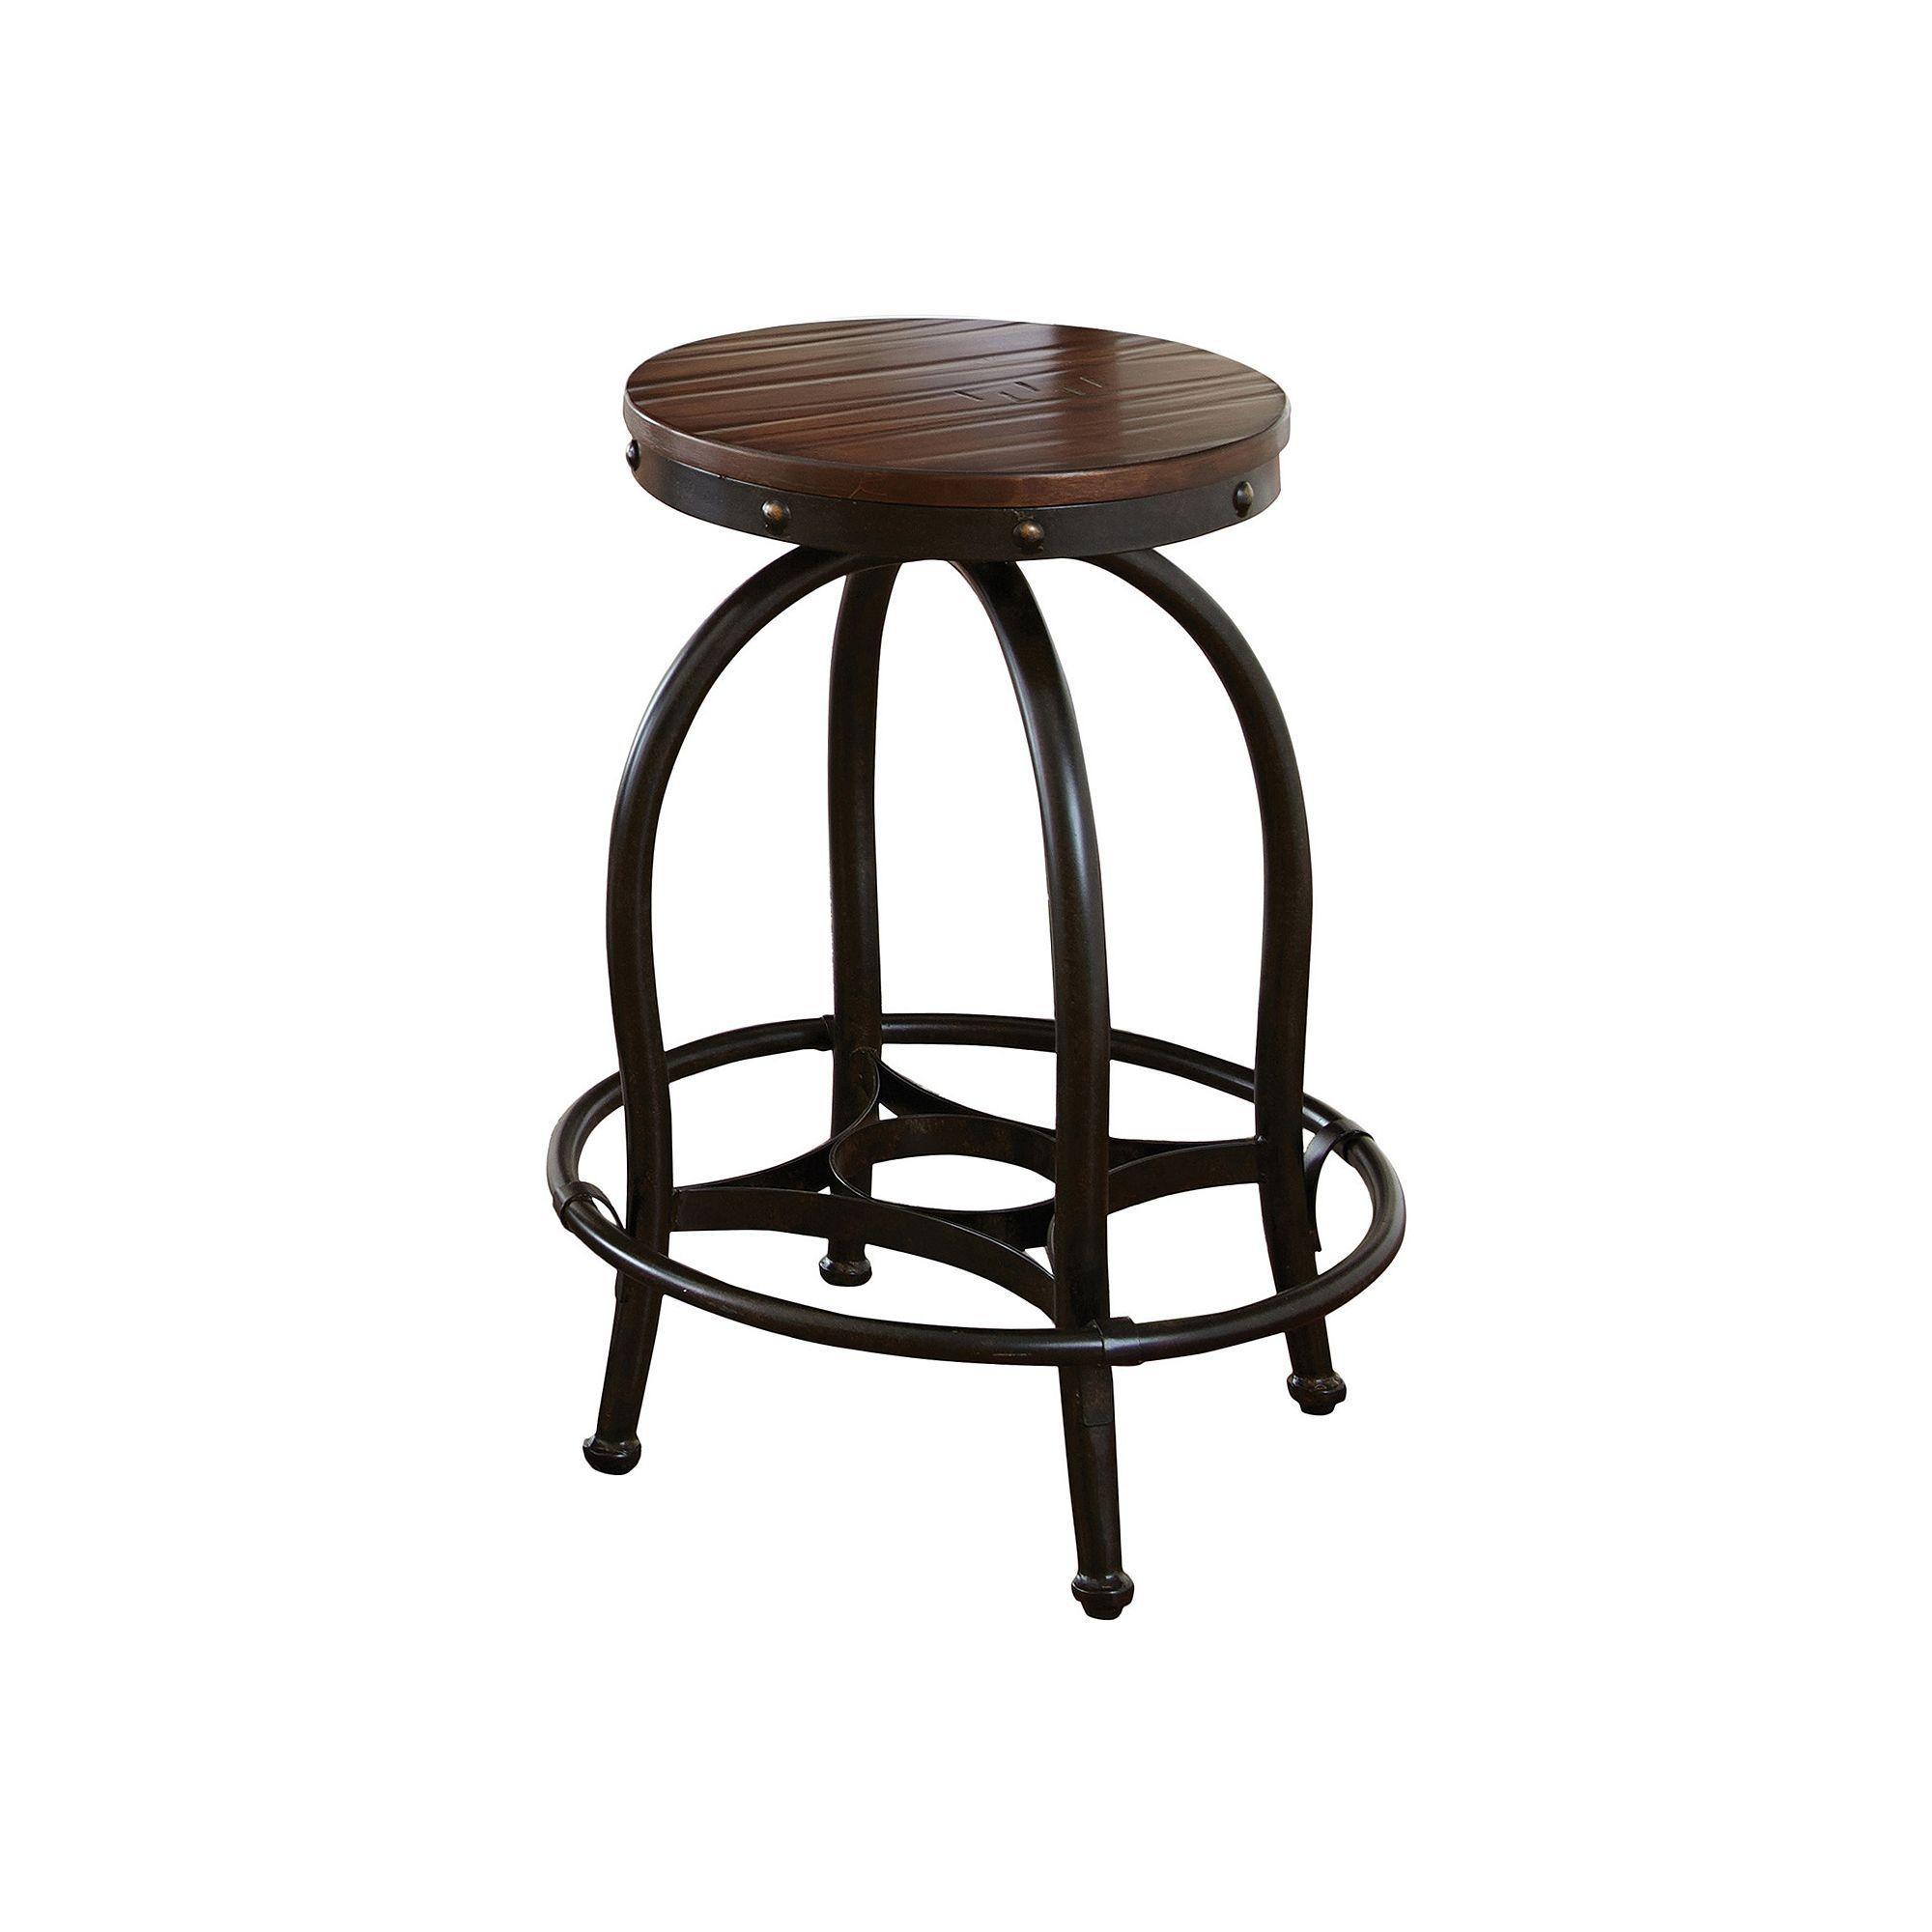 Marvelous Branton Home Winston Counter Stool Products Counter Short Links Chair Design For Home Short Linksinfo